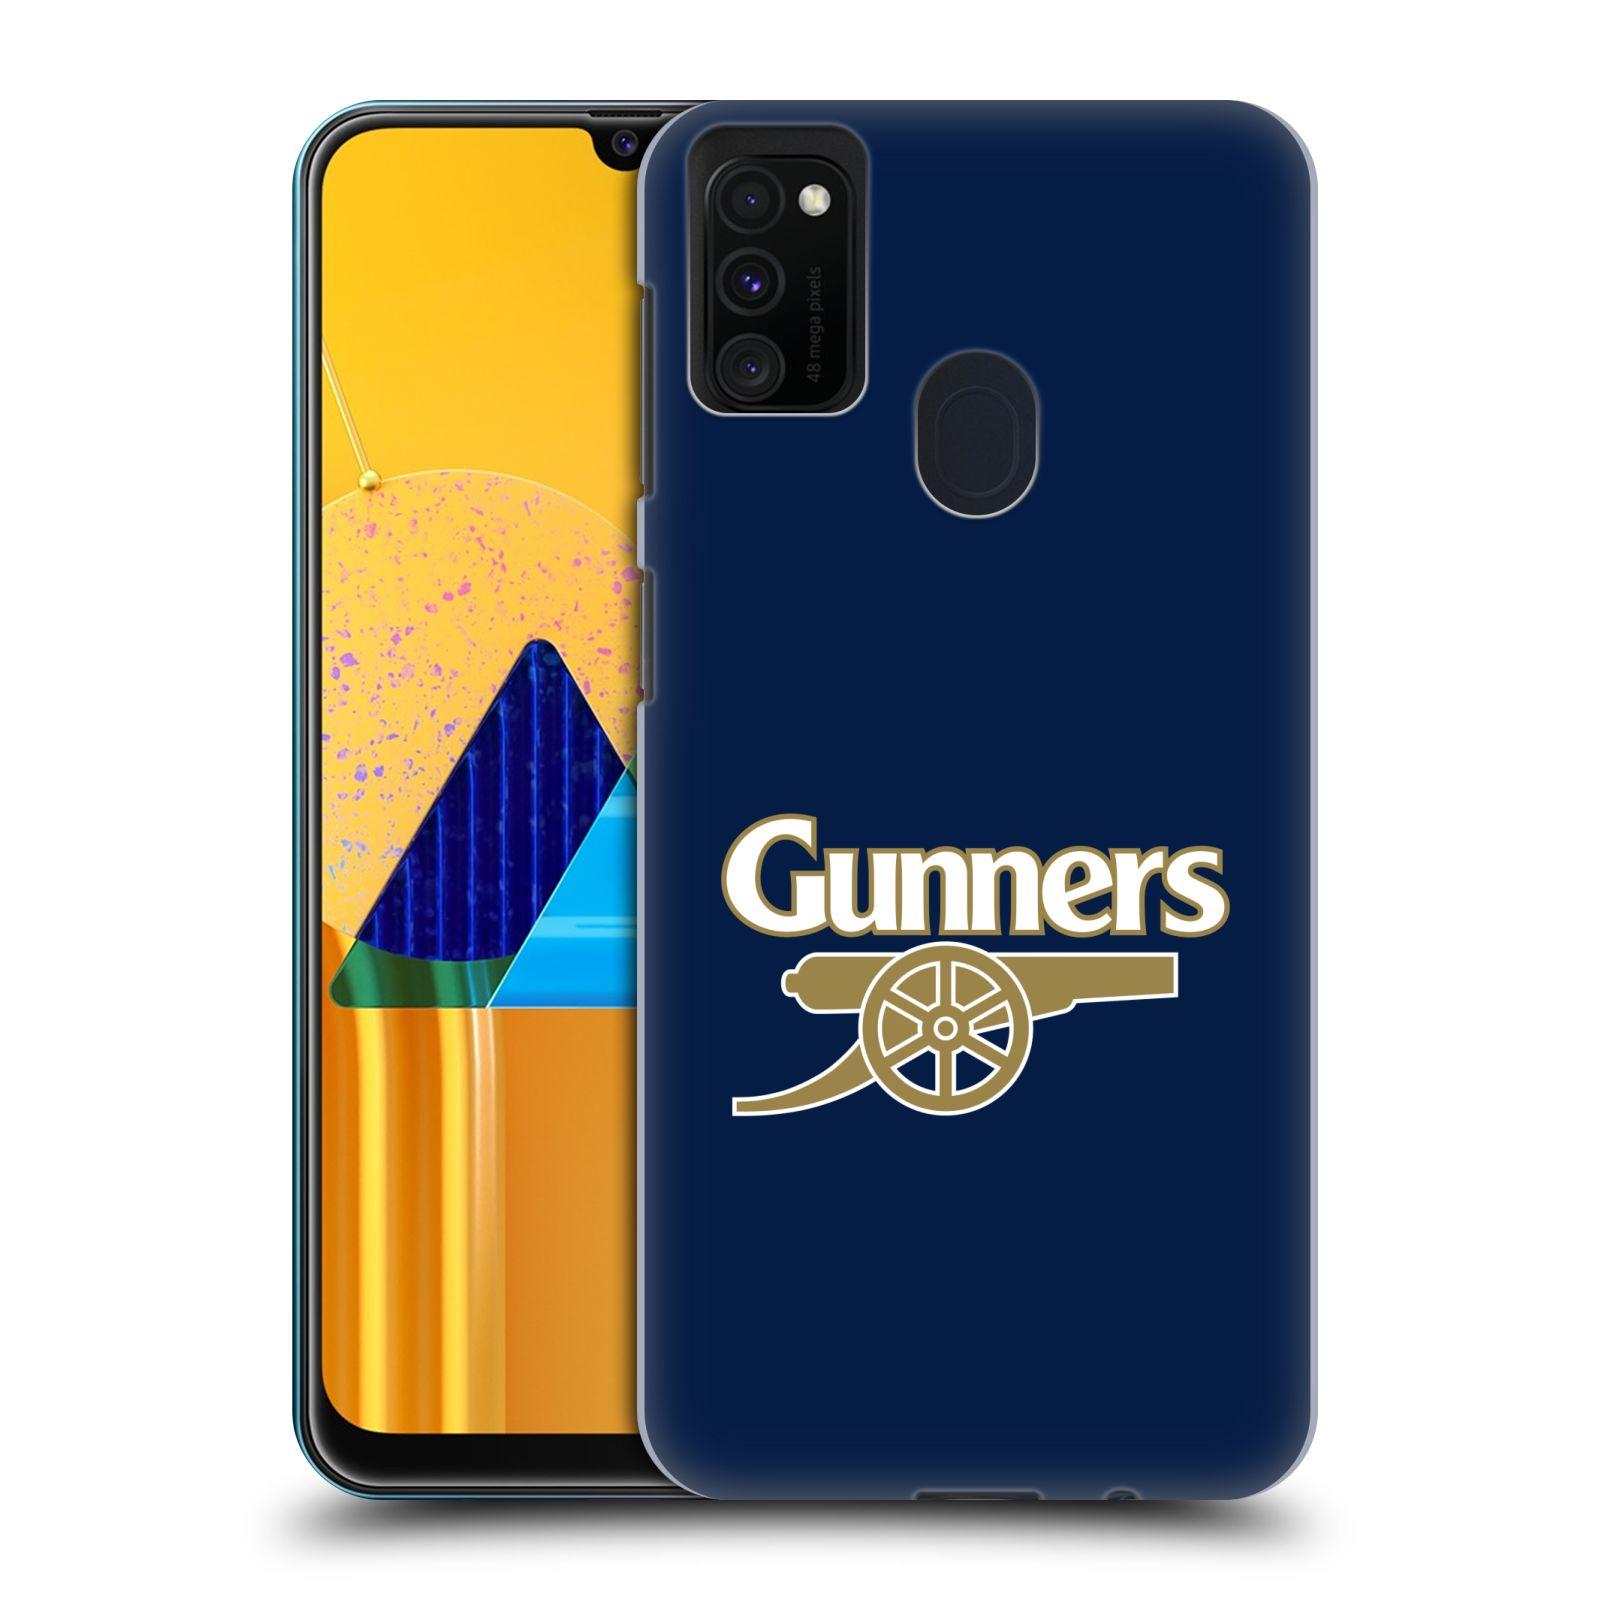 Plastové pouzdro na mobil Samsung Galaxy M21 - Head Case - Arsenal FC - Gunners